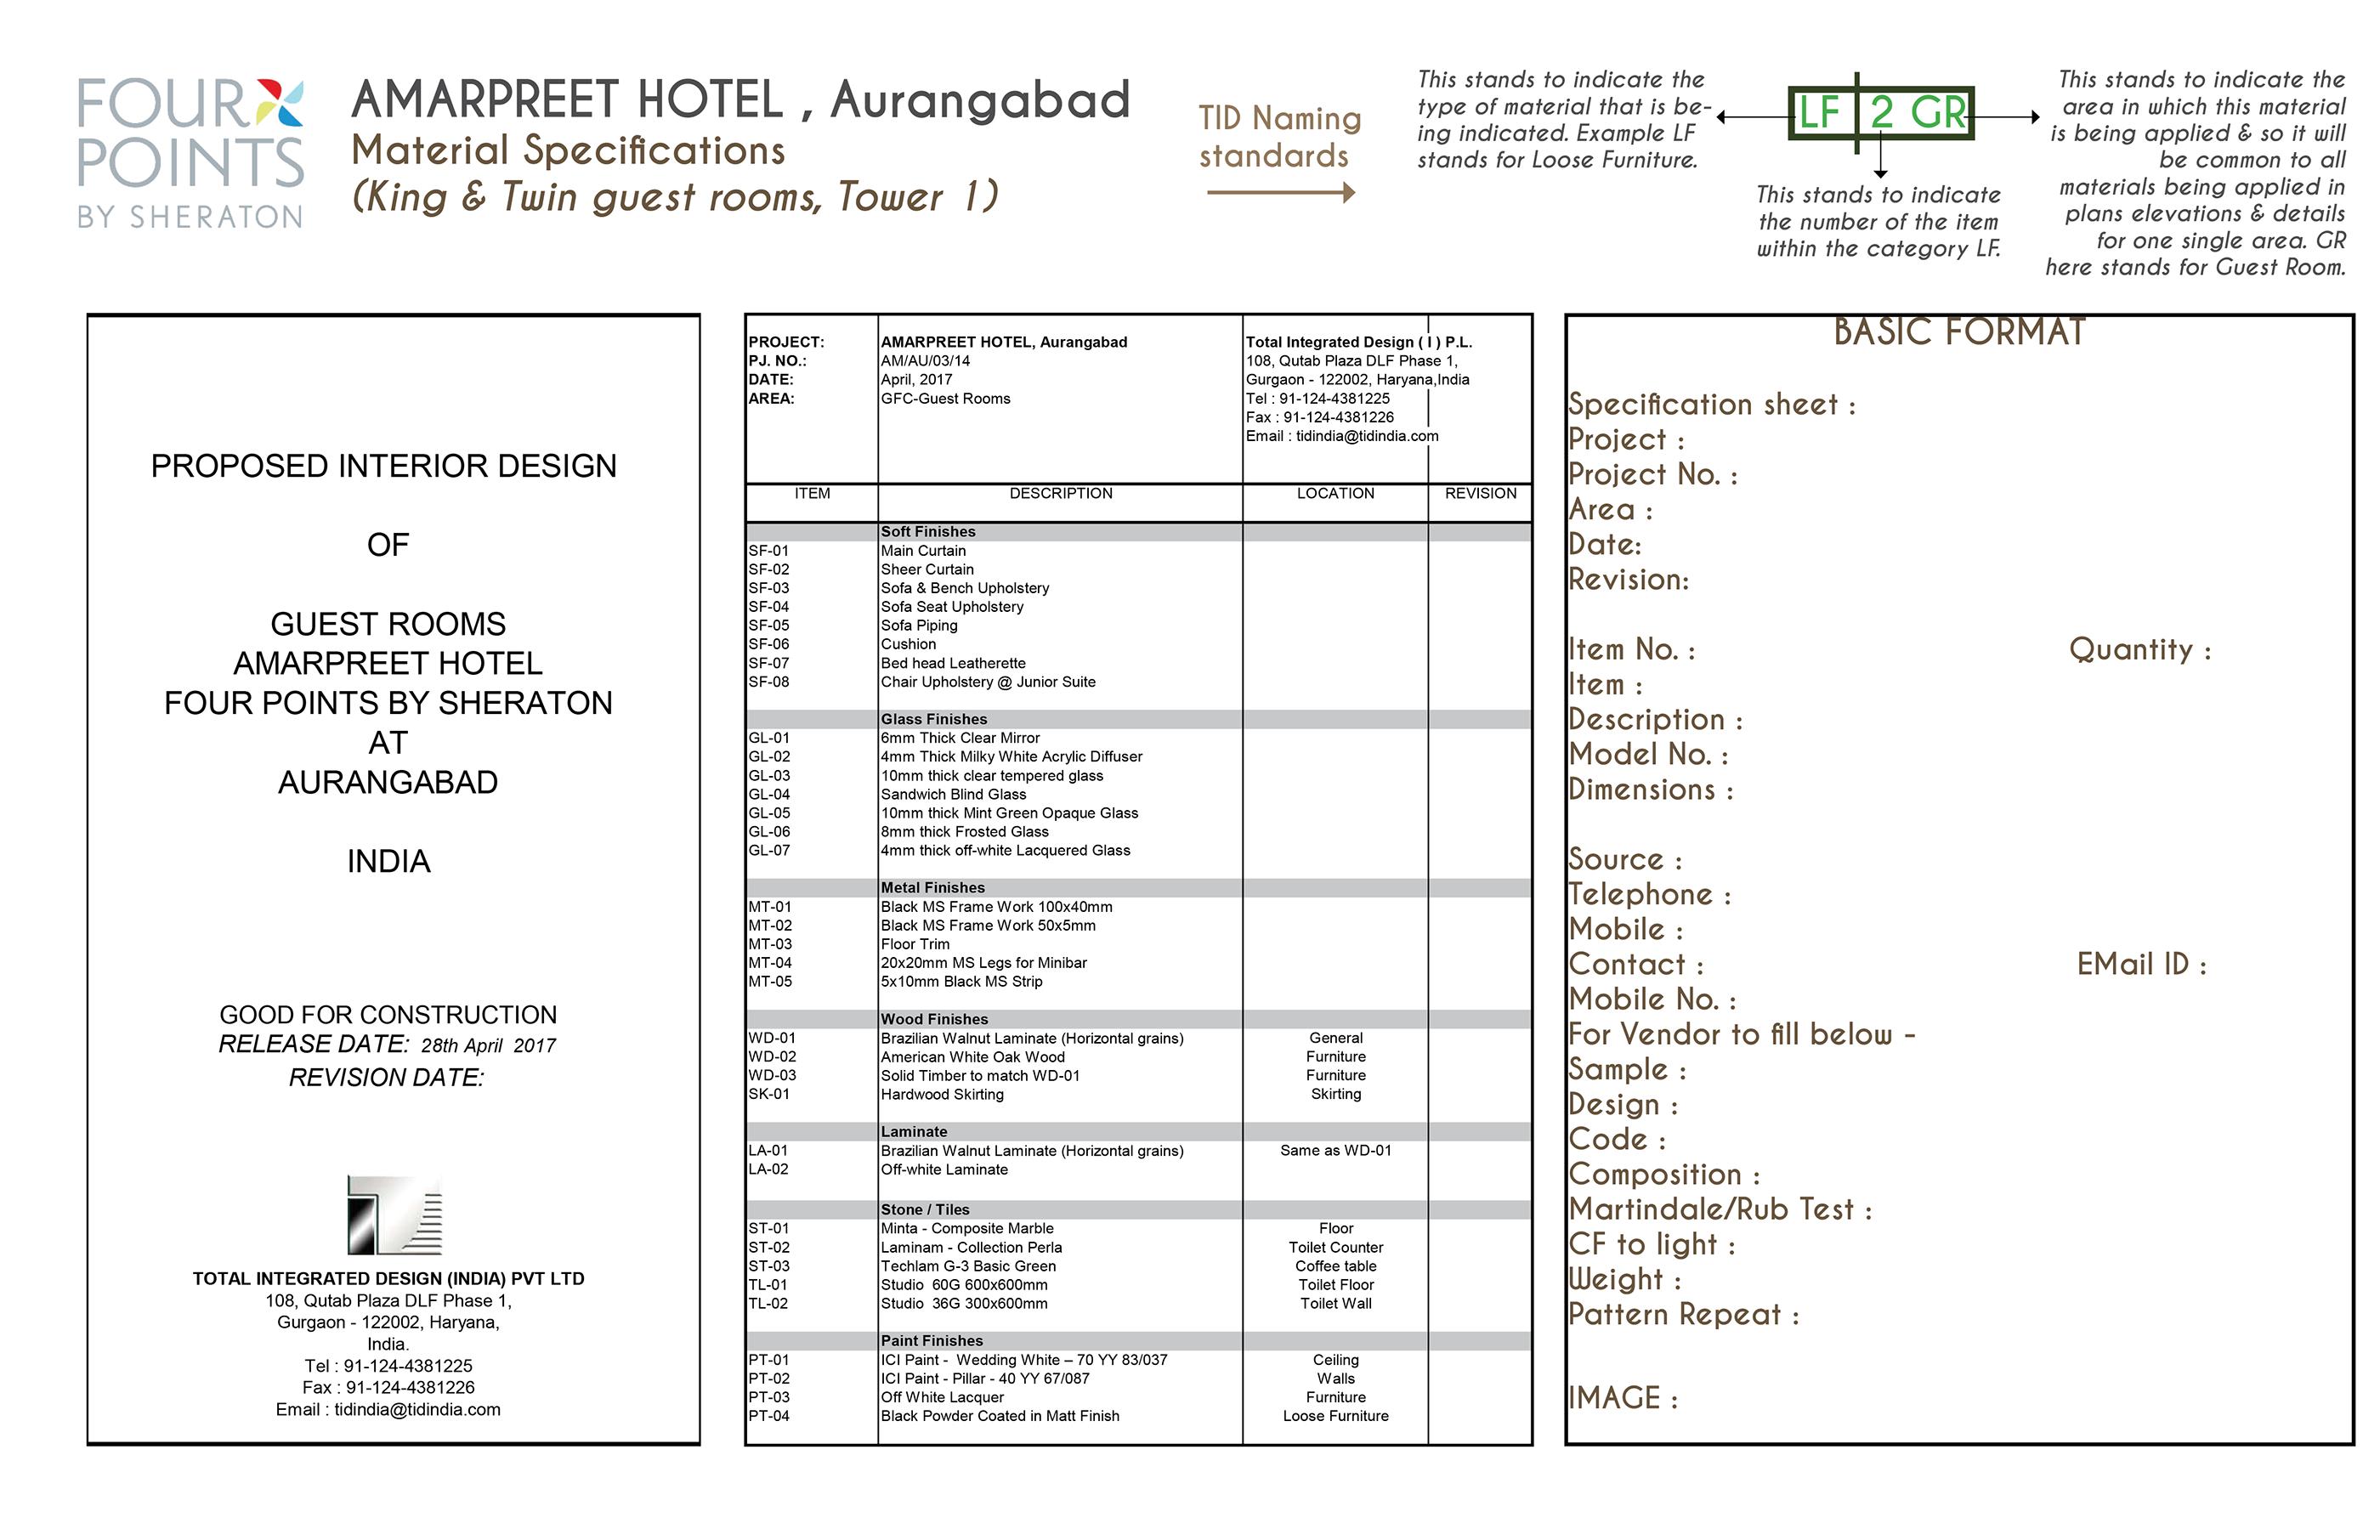 Internship Report : Total Integrated Design (16 weeks) on Behance